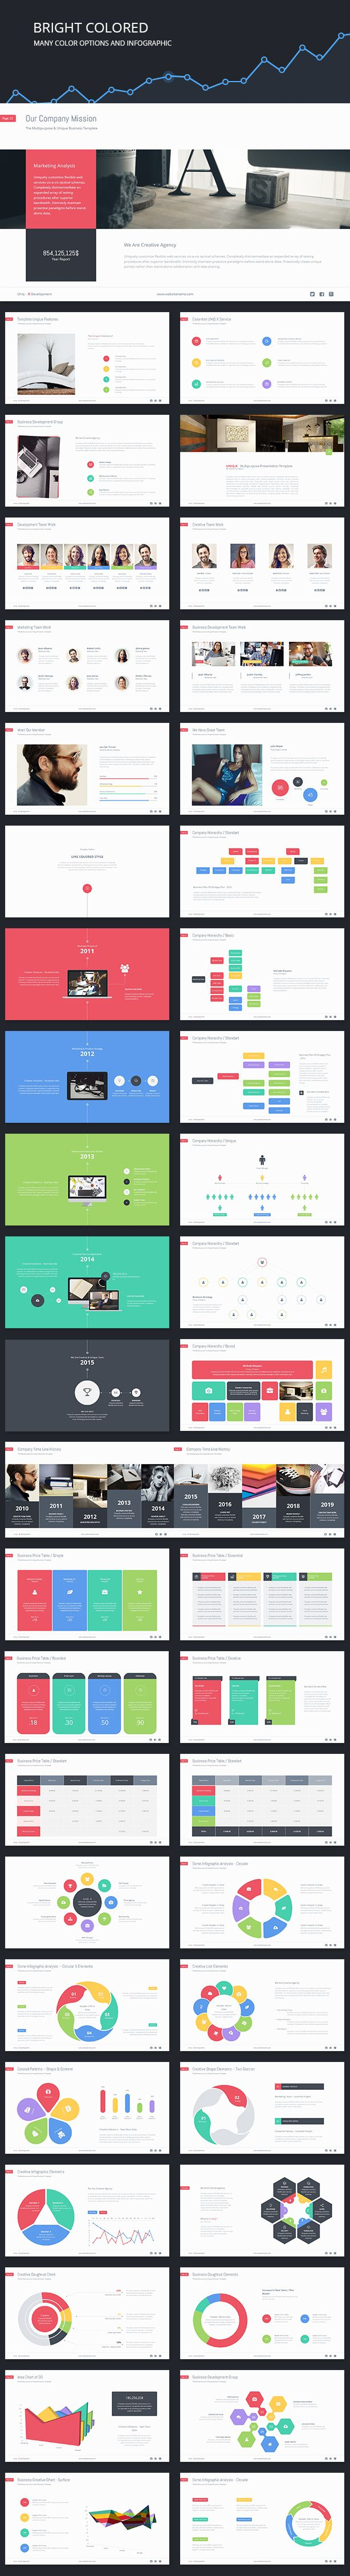 UNIQ-X Multipurpose PowerPoint Template #design Download: http://graphicriver.net/item/uniqx-multipurpose-template/11704189?ref=ksioks